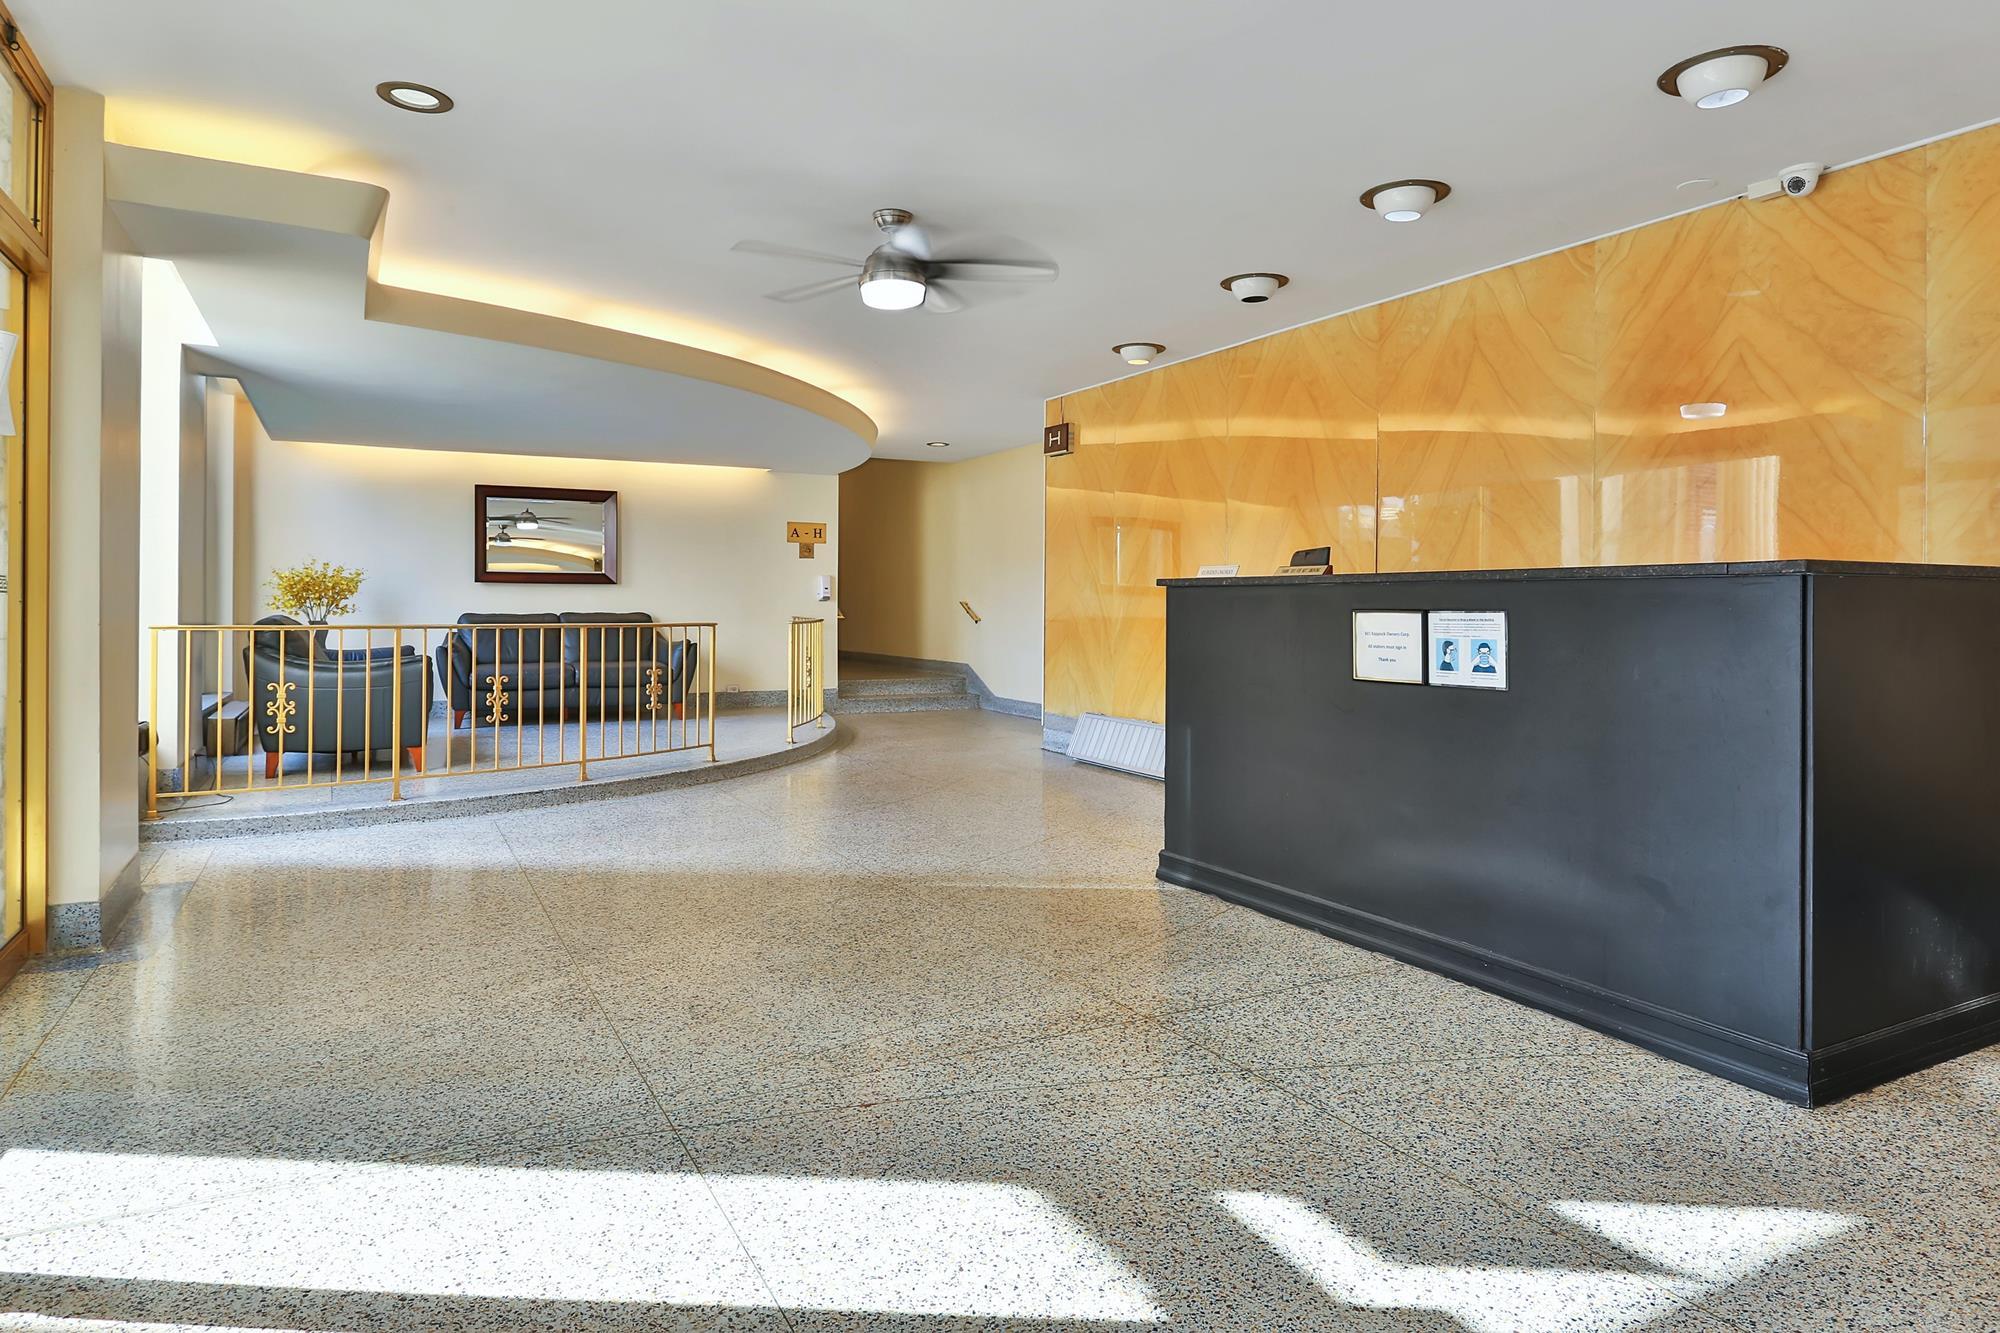 Spacious, Newly Renovated 1-Bd. Co-op w/ Doormen & Pool